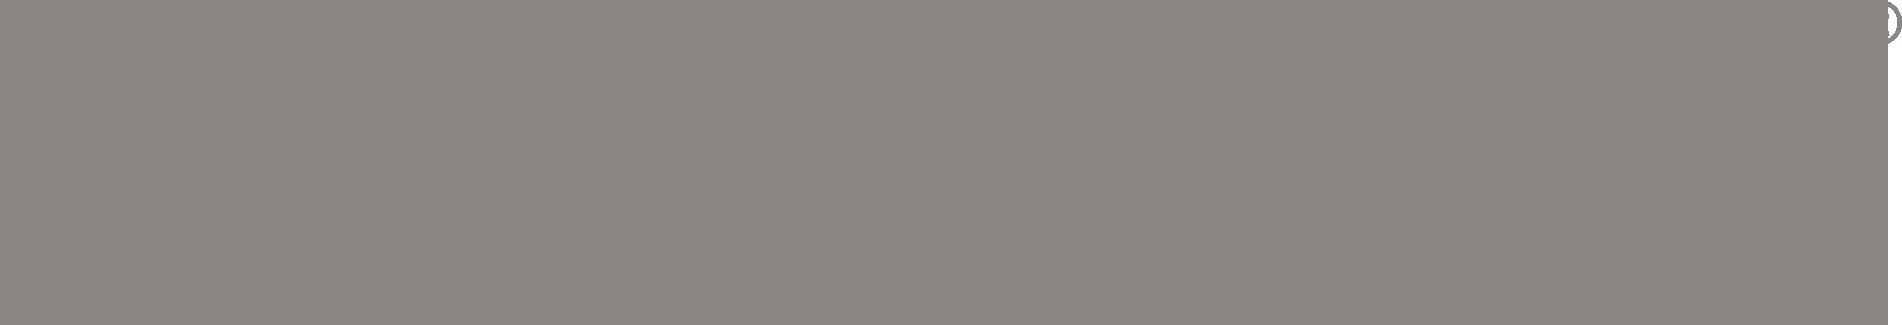 scanpan-denmark-logo-1.png